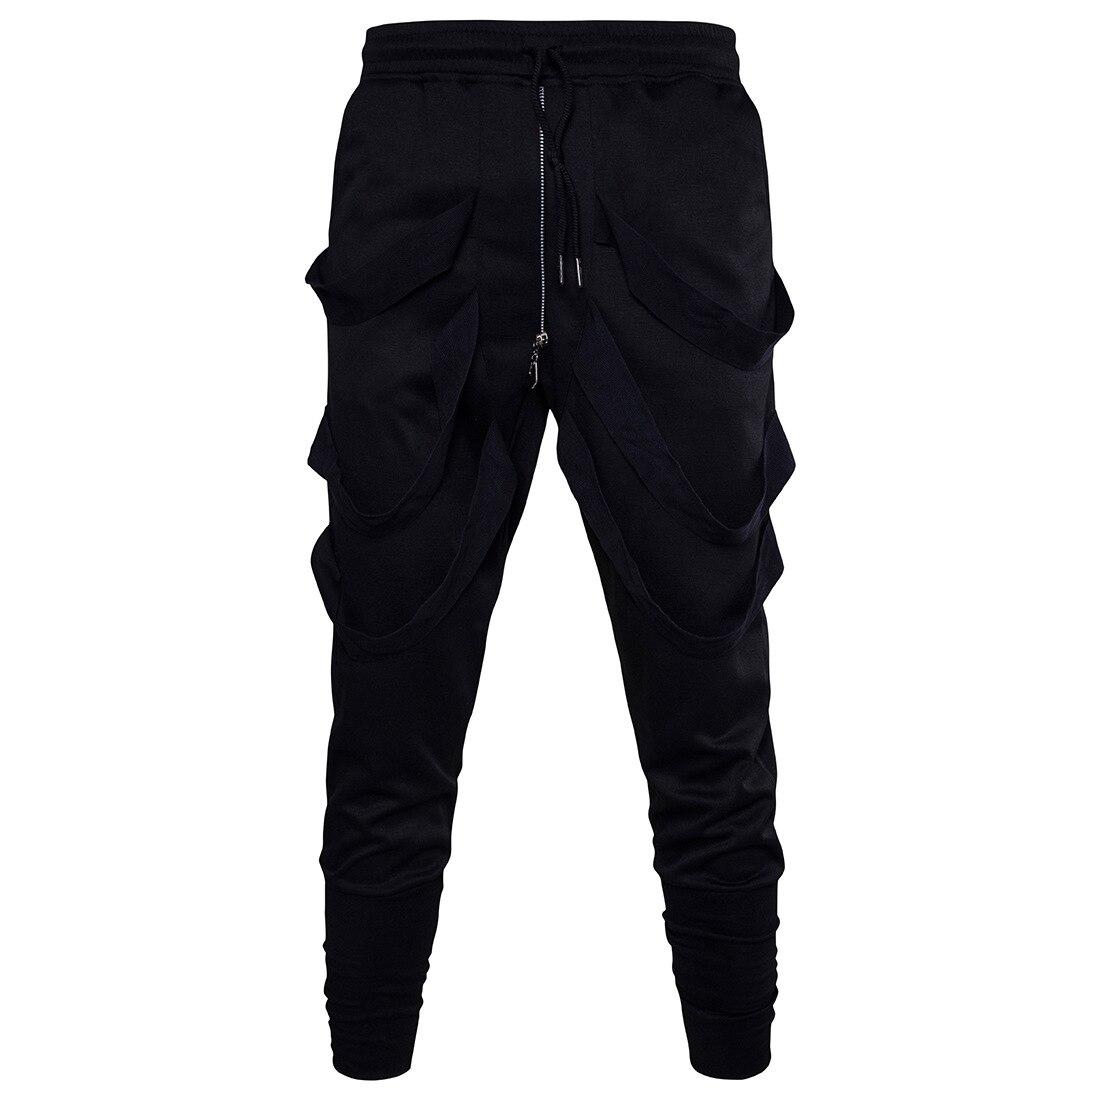 AliExpress EBay Wish Men'S Wear Men Harem Pants Hot Selling Low-crotch Flare Cut Casual Sports Pants Length Pants